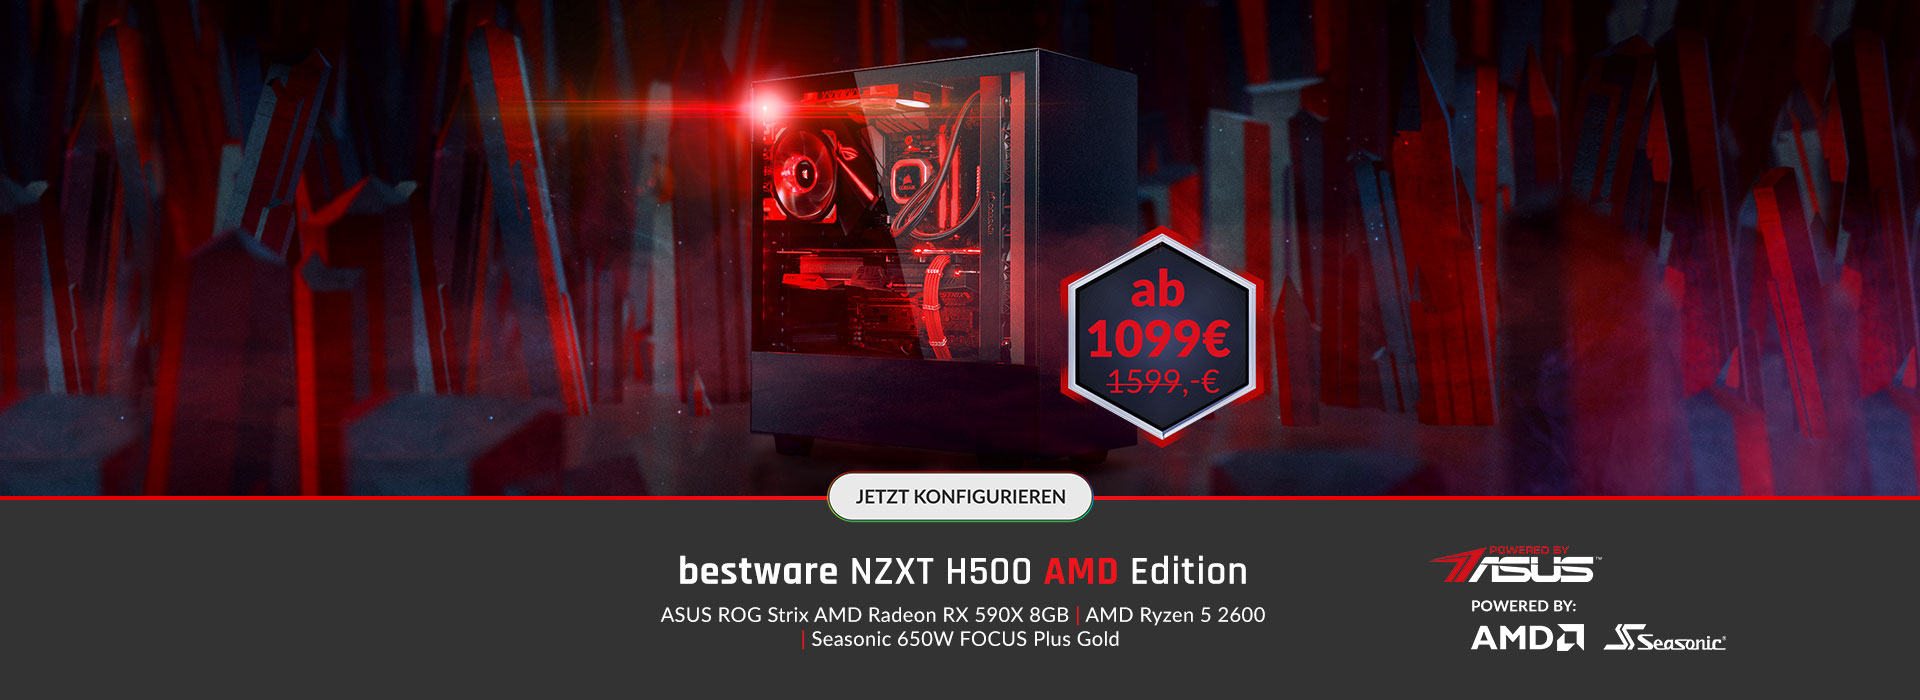 bestware NZXT H500 - AMD Edition